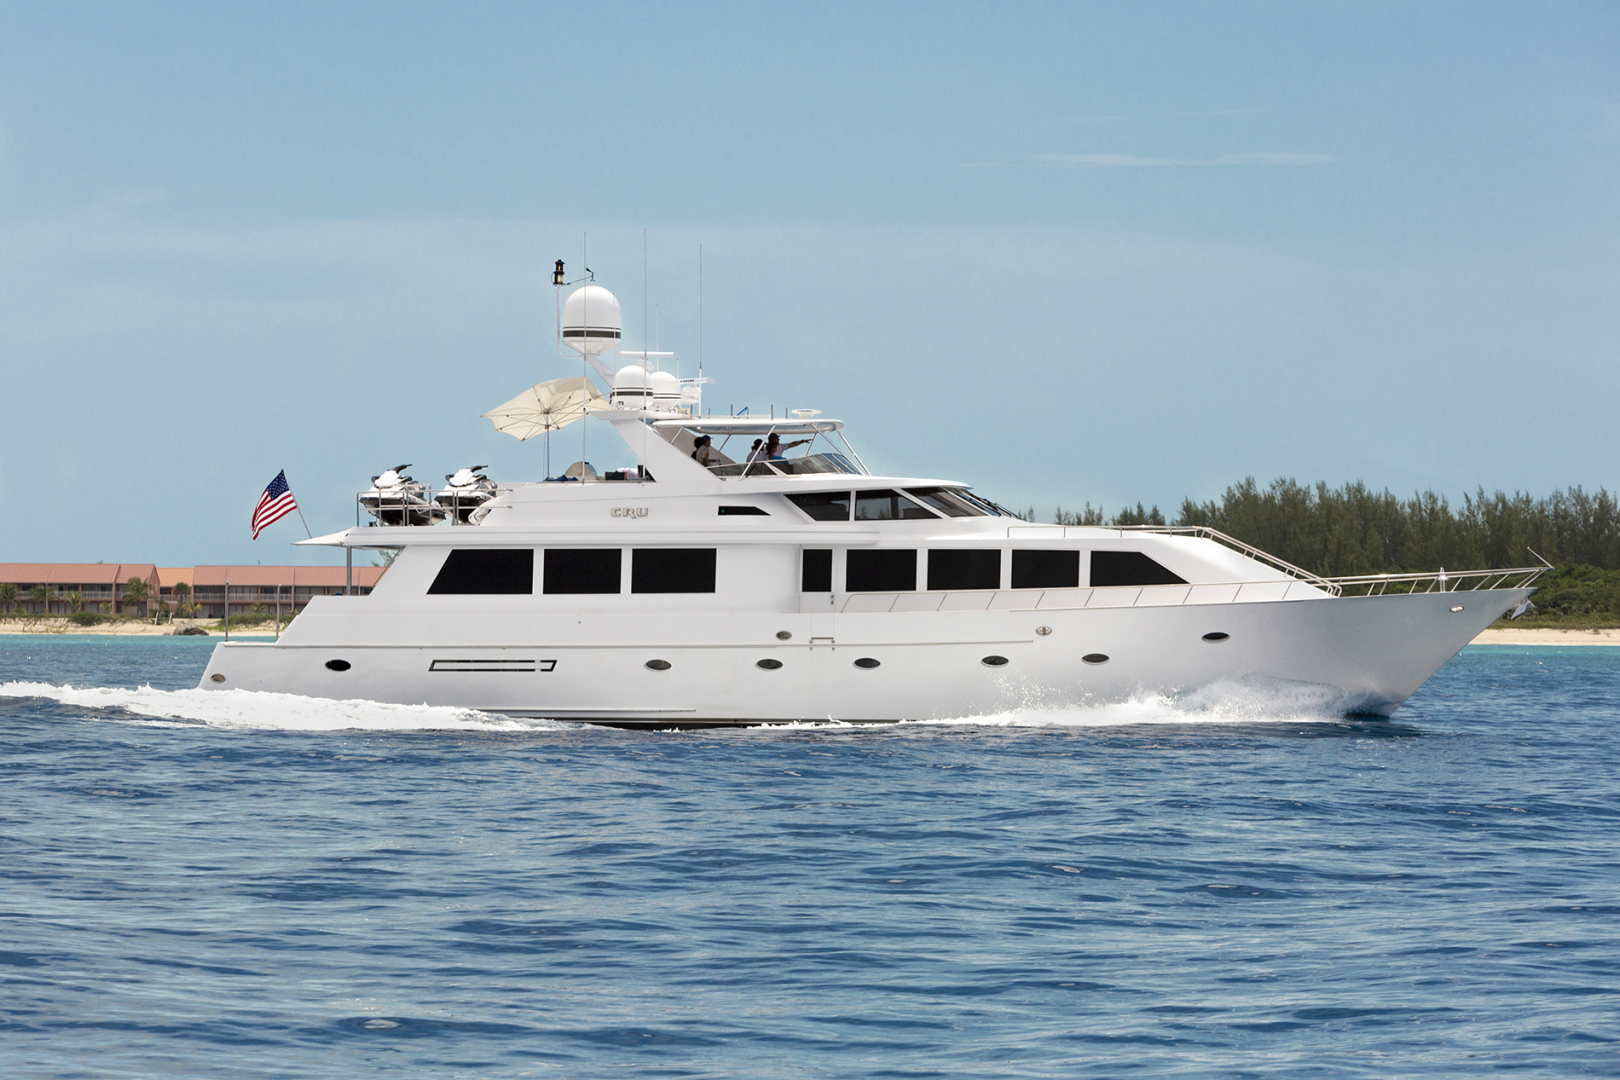 96' Westship 1991 Motor Yacht Cru